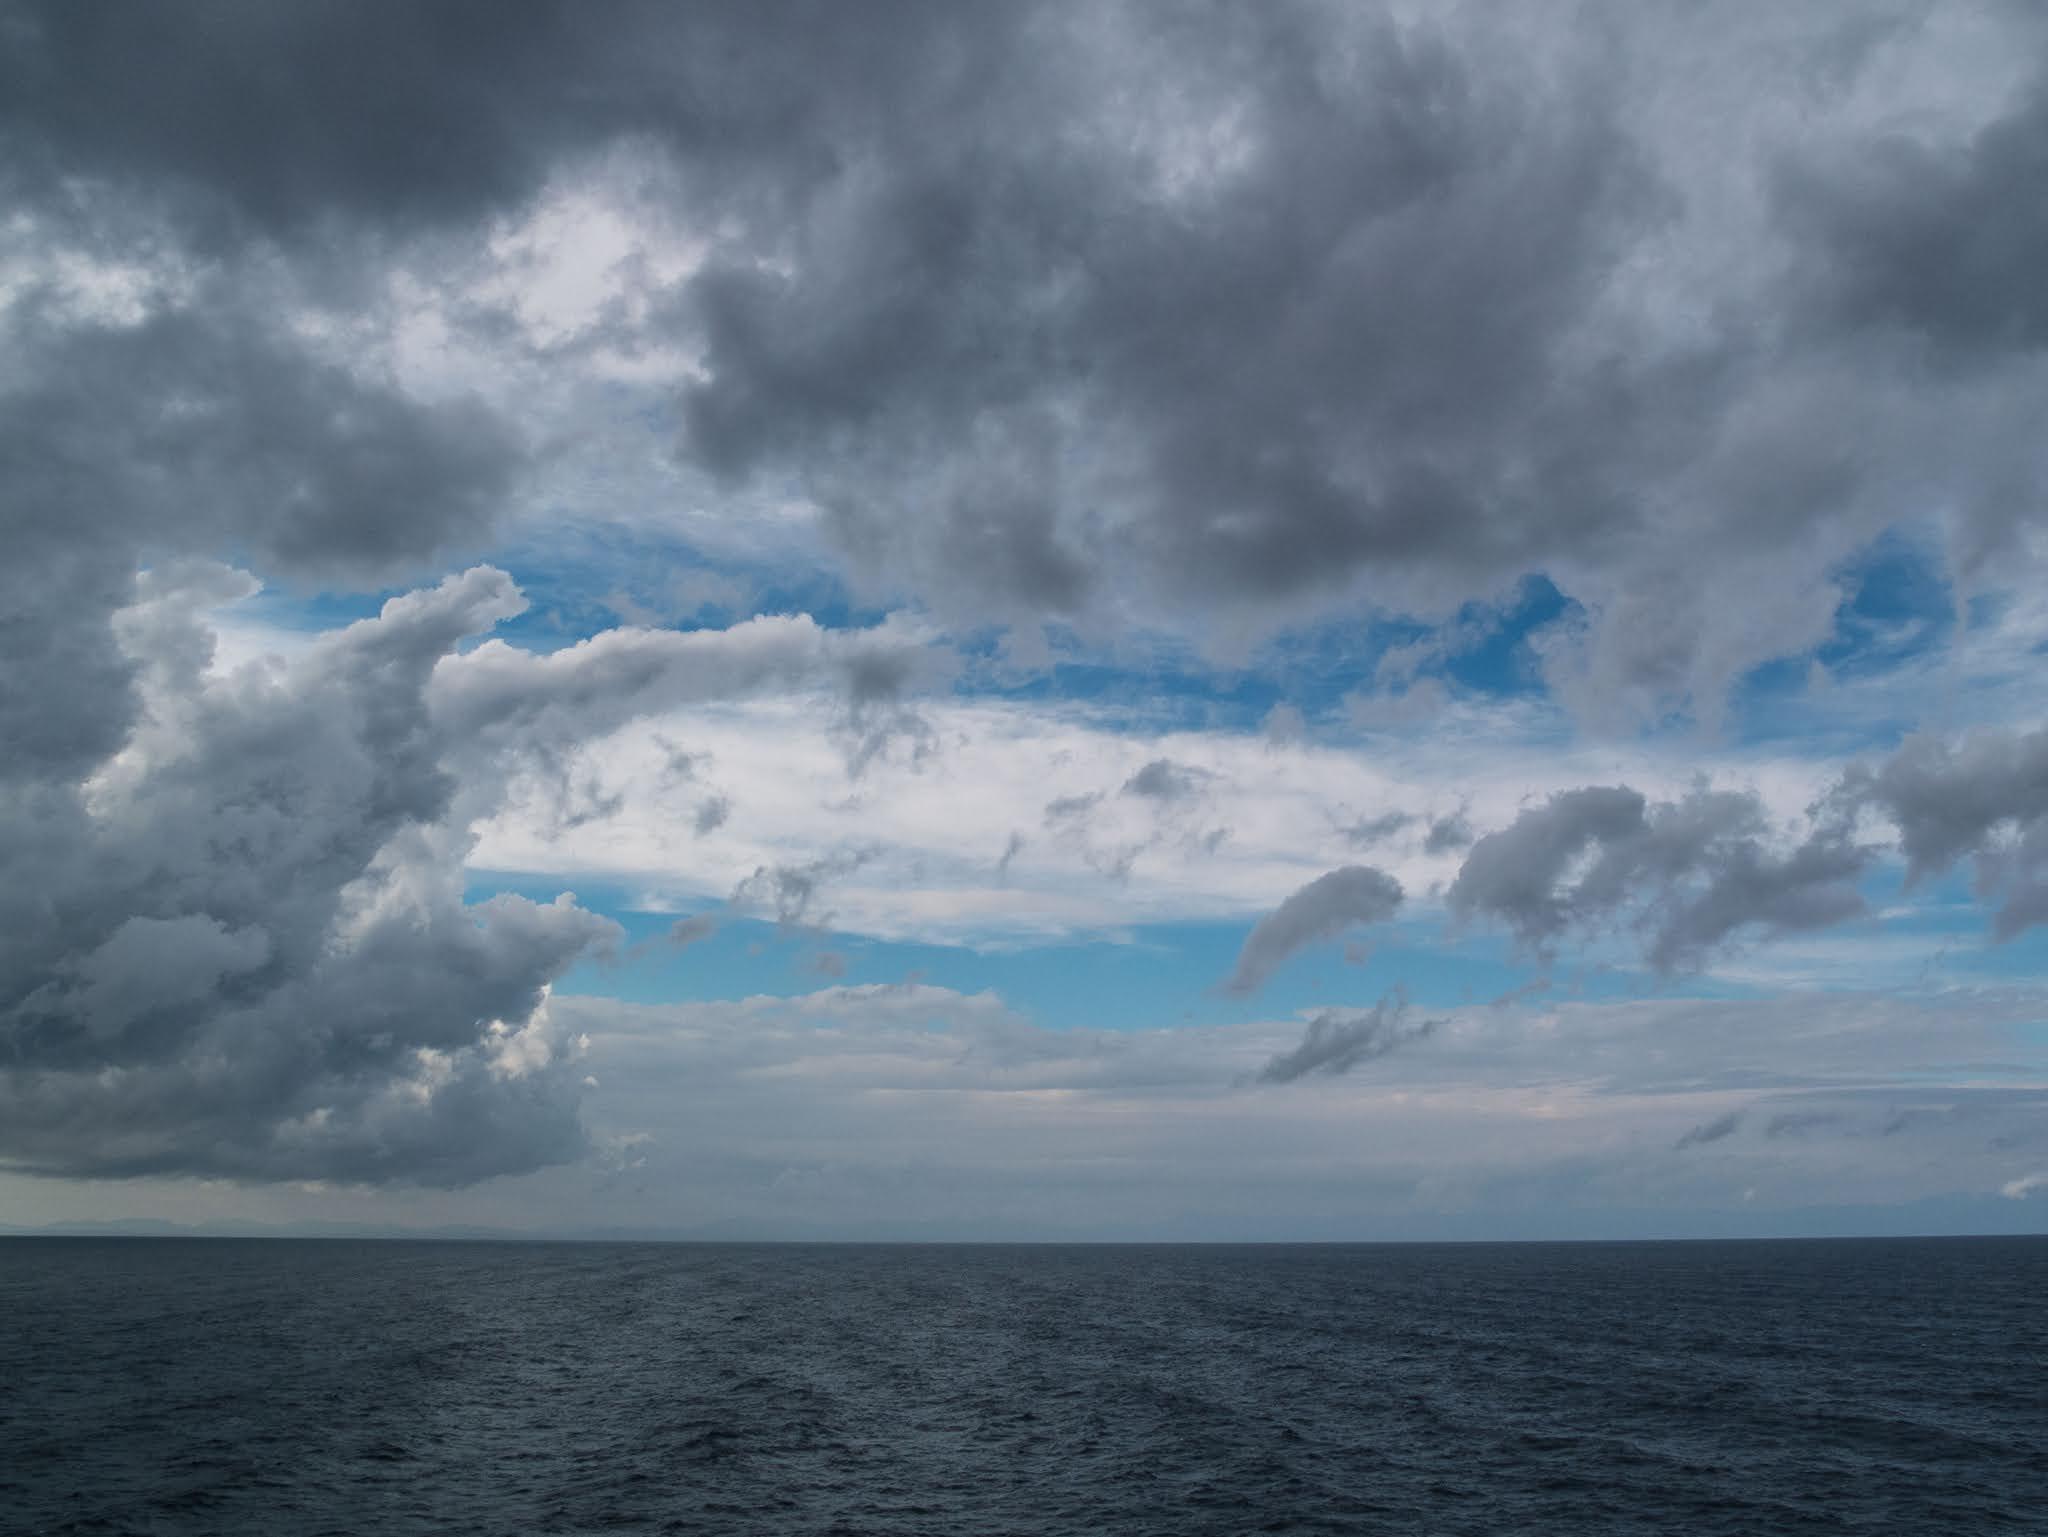 Cloudy sky over the Mediterranean Sea.